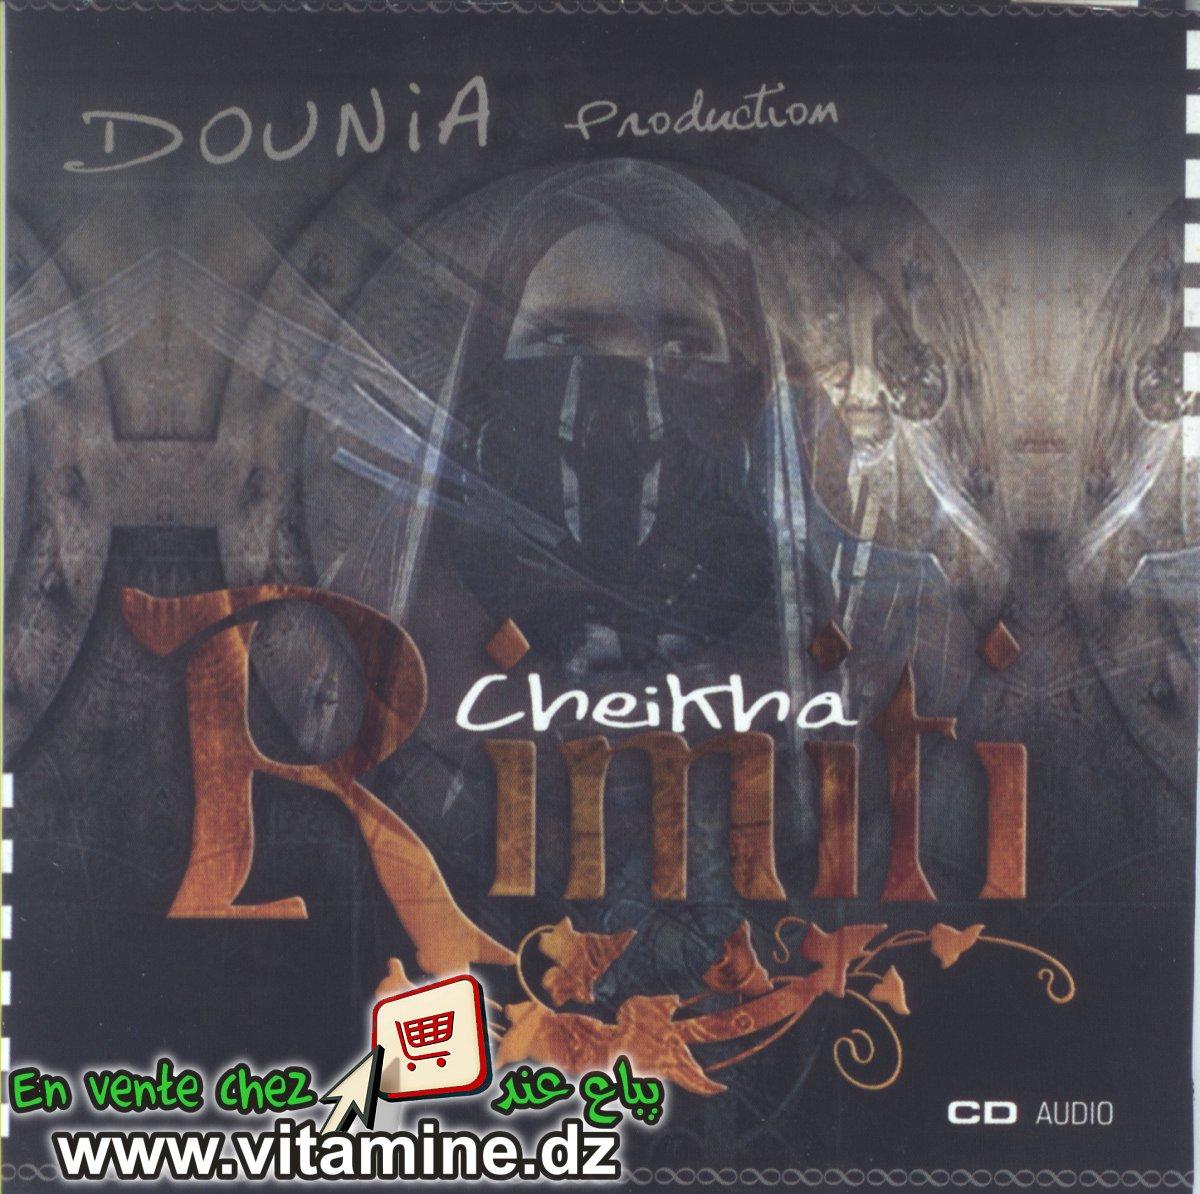 Cheikha Rimitti - Compilation